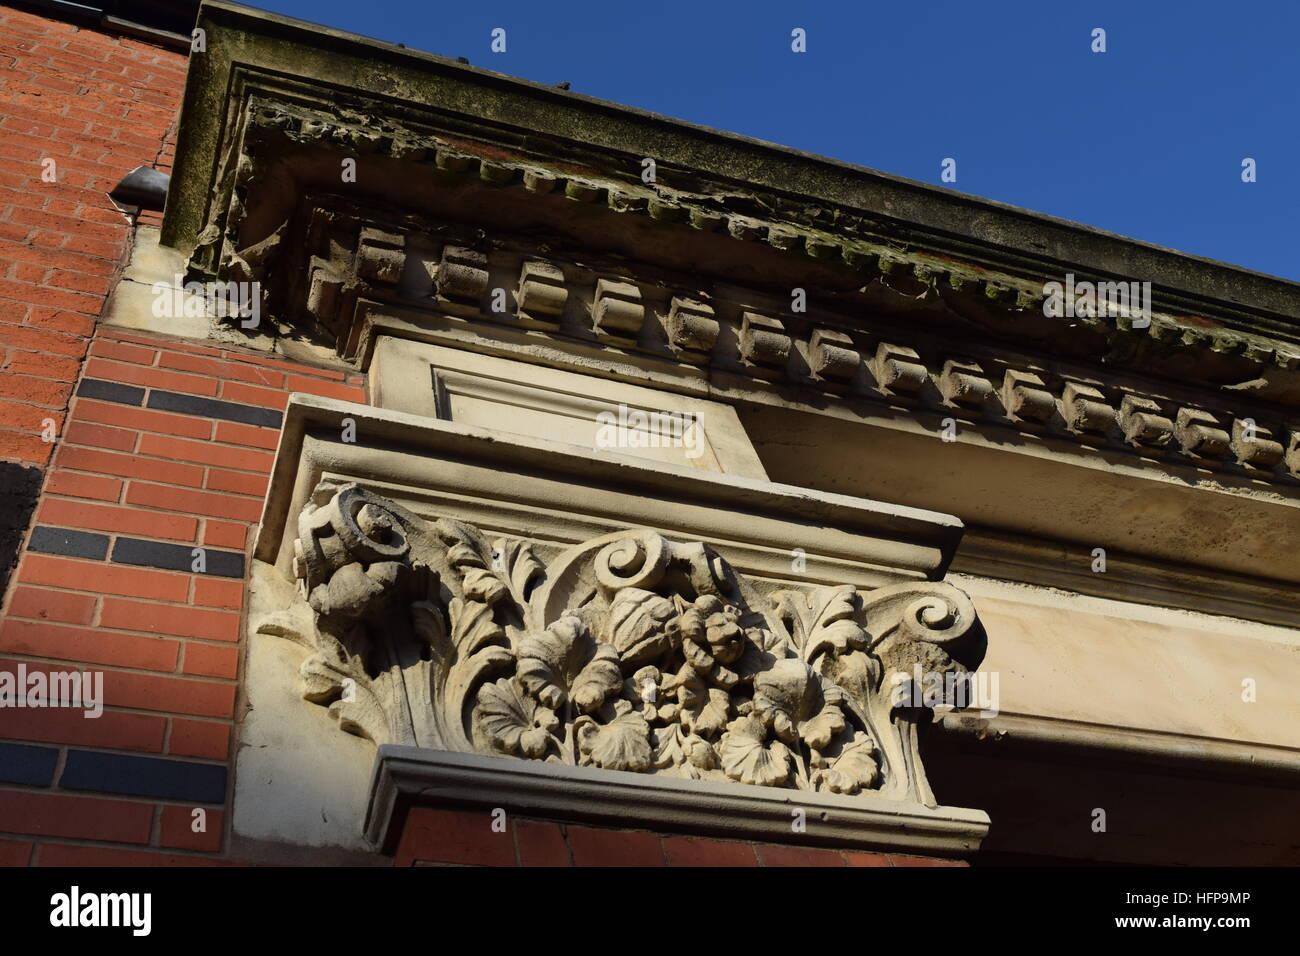 Decaying Corinthian capitals on a rectangular arch in Princip Street in Birmingham's Gun Quarter - Stock Image